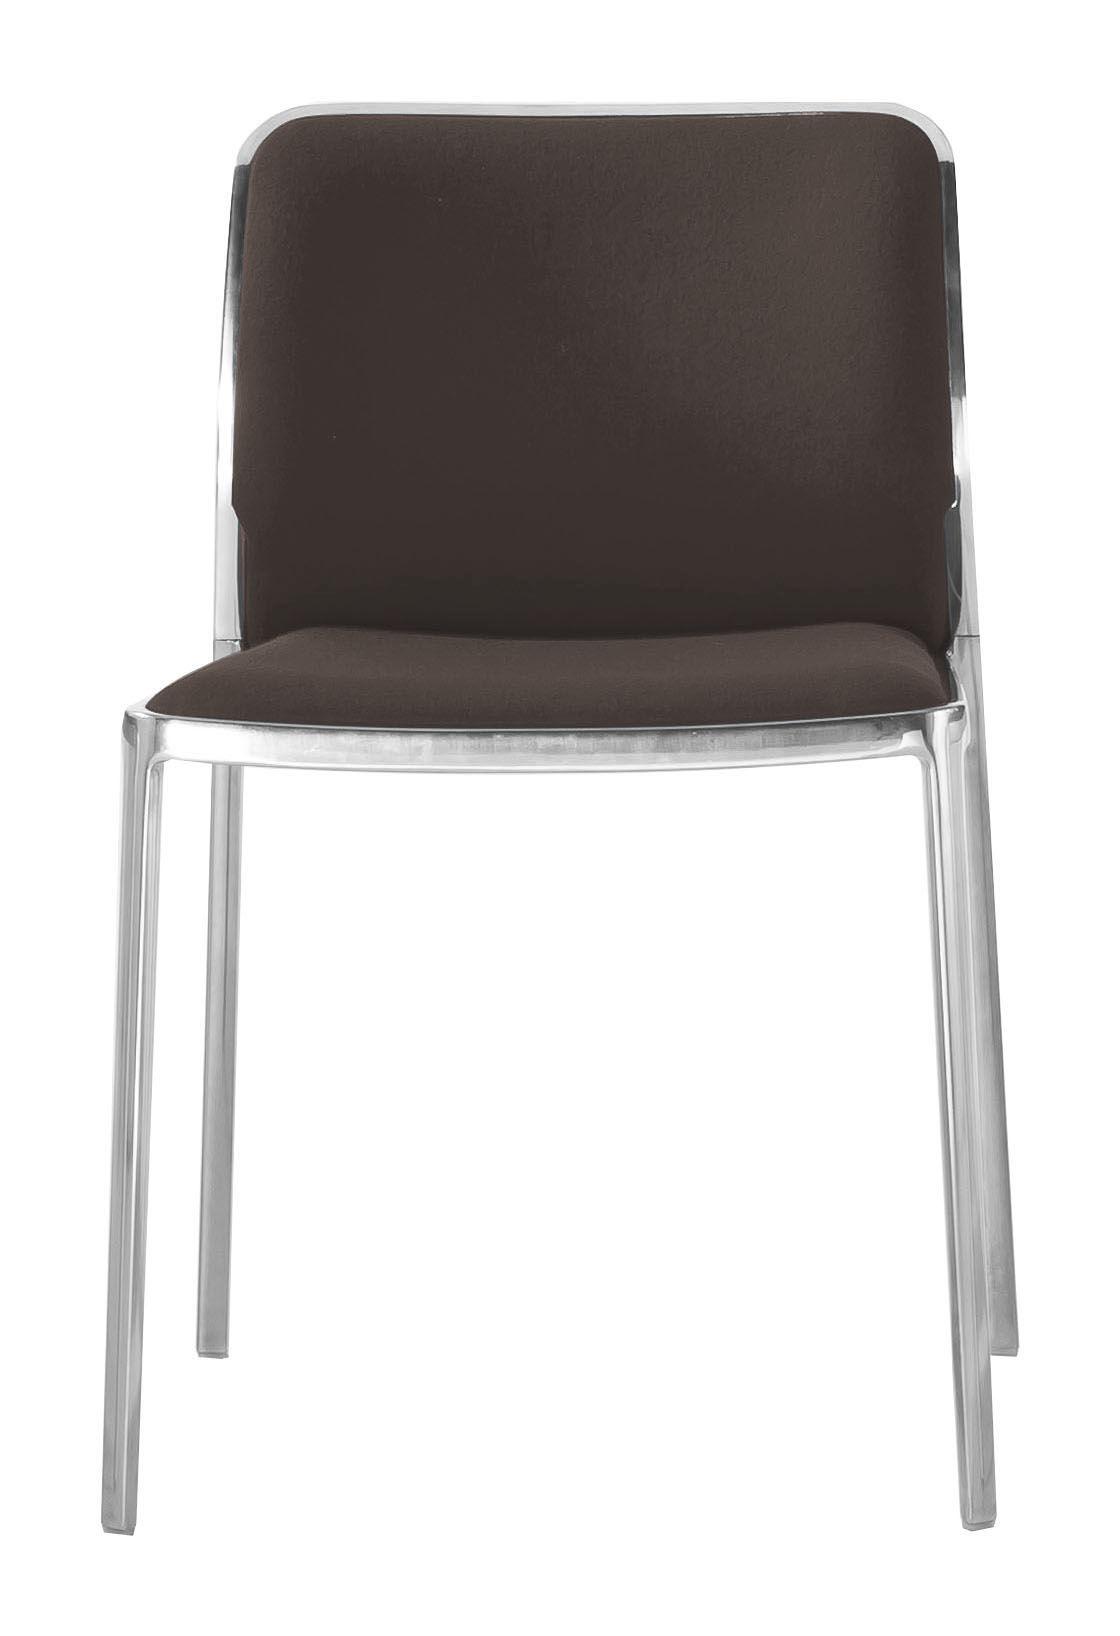 Möbel - Stühle  - Audrey Soft Gepolsterter Stuhl / Sitzfläche aus Stoff - Gestell Aluminium poliert - Kartell - Gestell: Aluminium poliert / Sitzfläche: Trevira-Stoff braun - Gewebe, poliertes Aluminium